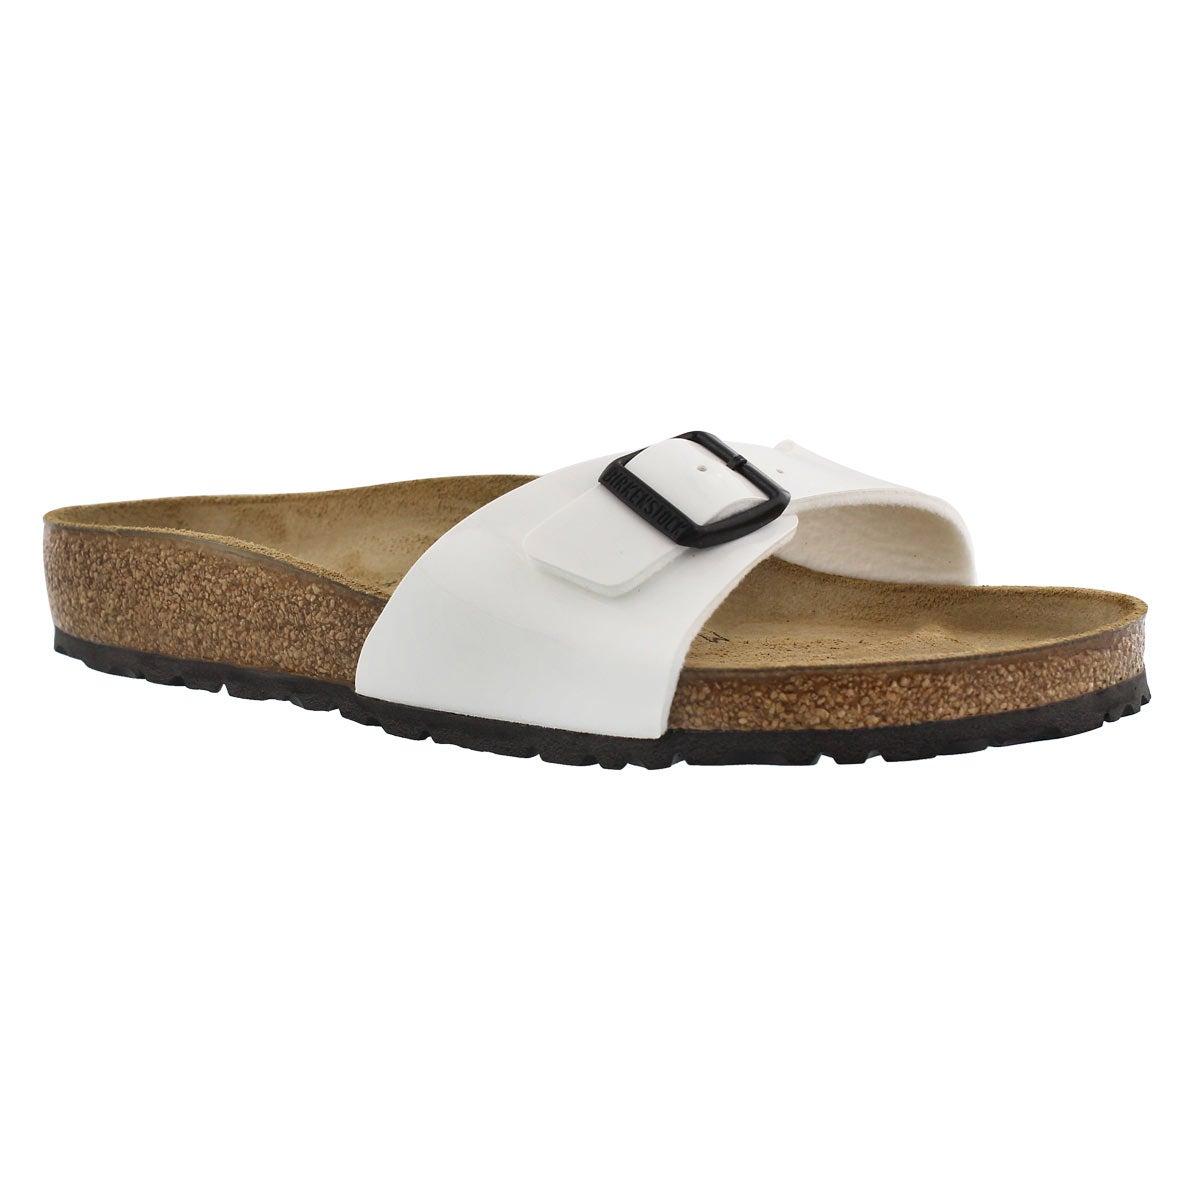 Women's MADRID white patent BF 1 strap sandals